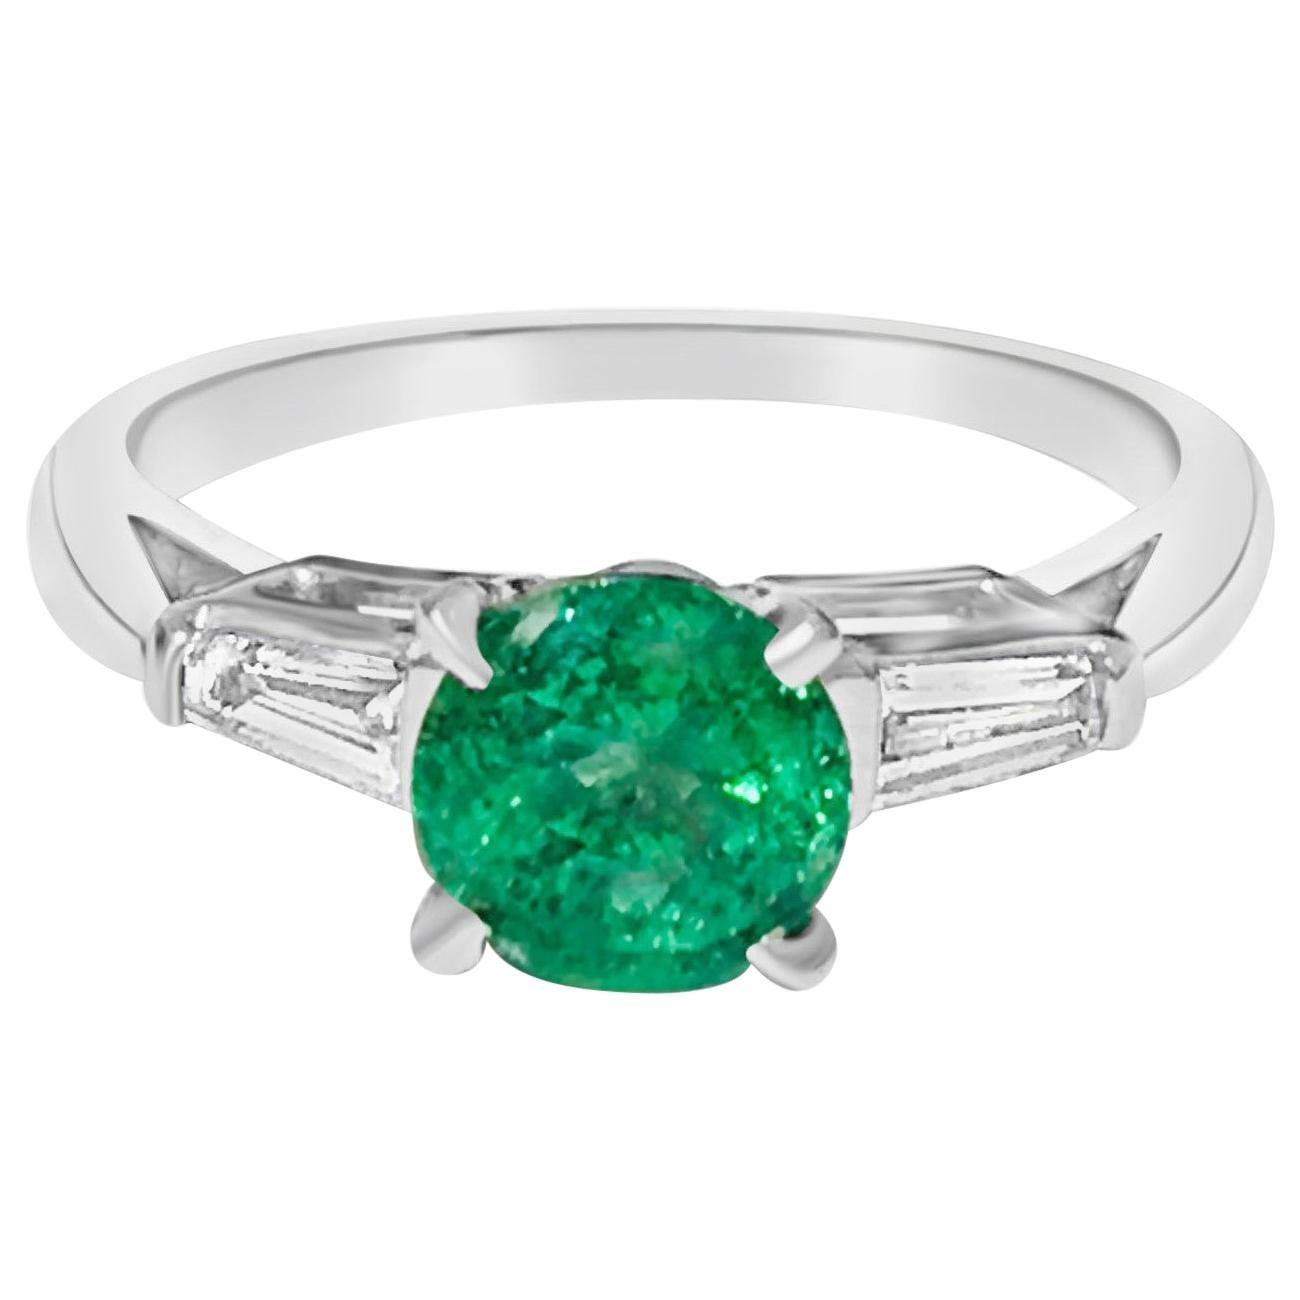 Vintage 1.50 Carat Natural Emerald Diamond Cocktail Engagement Ring